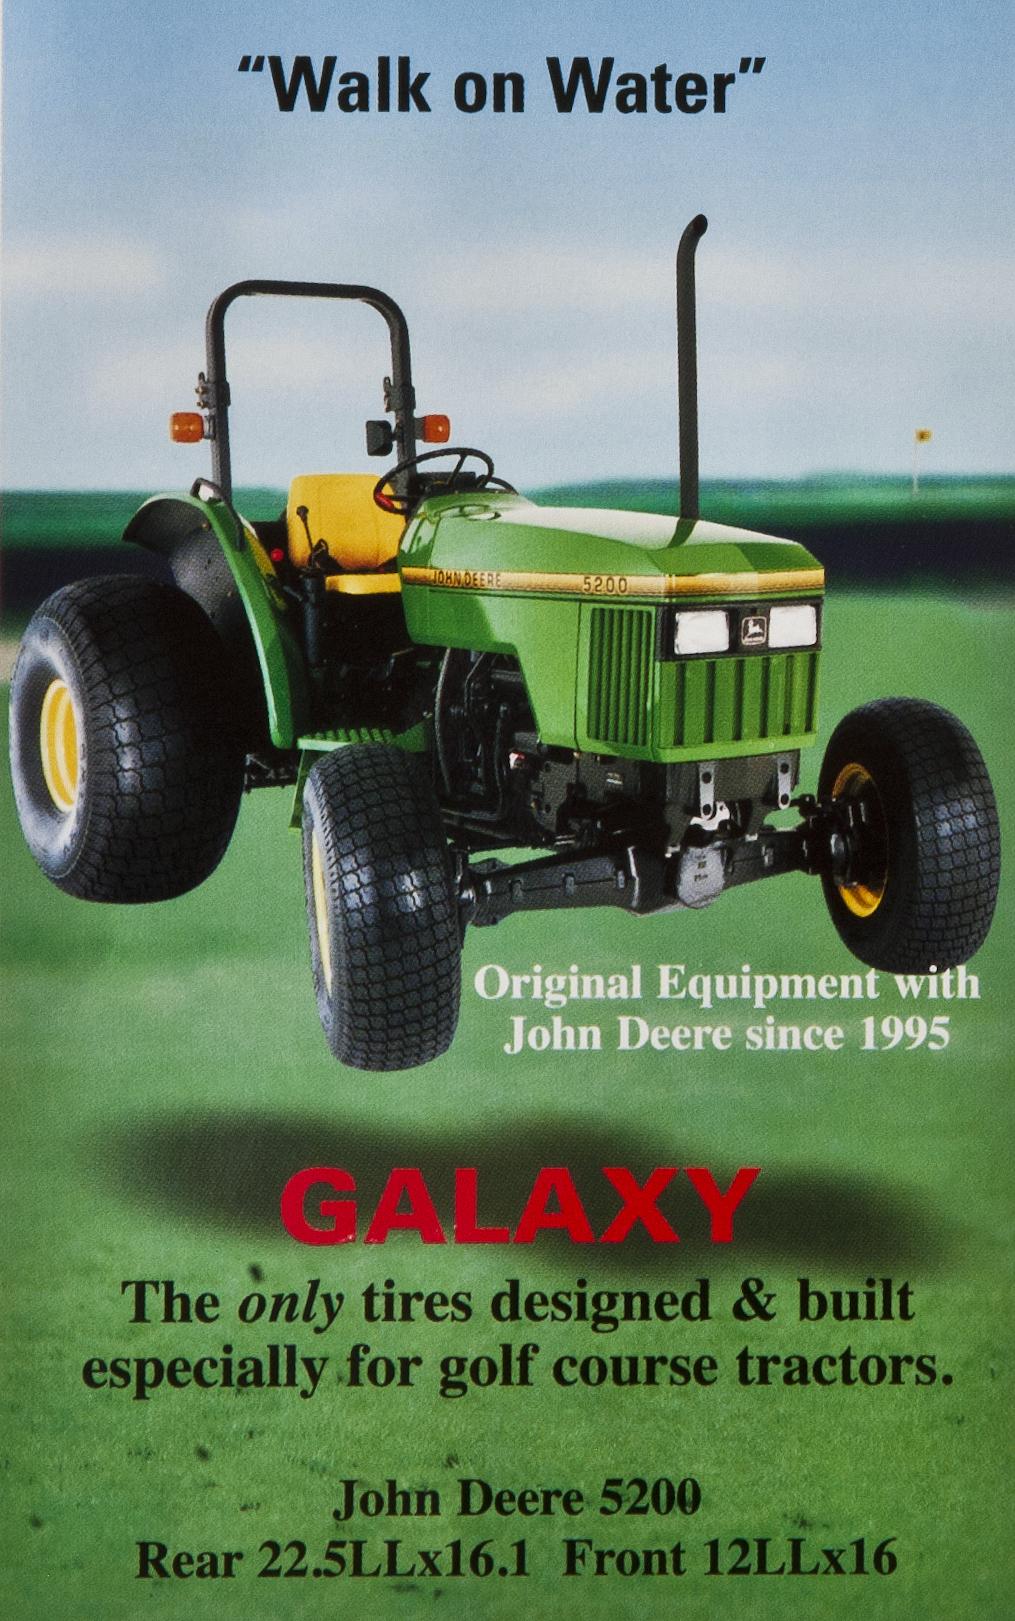 Galaxy Turf Tires